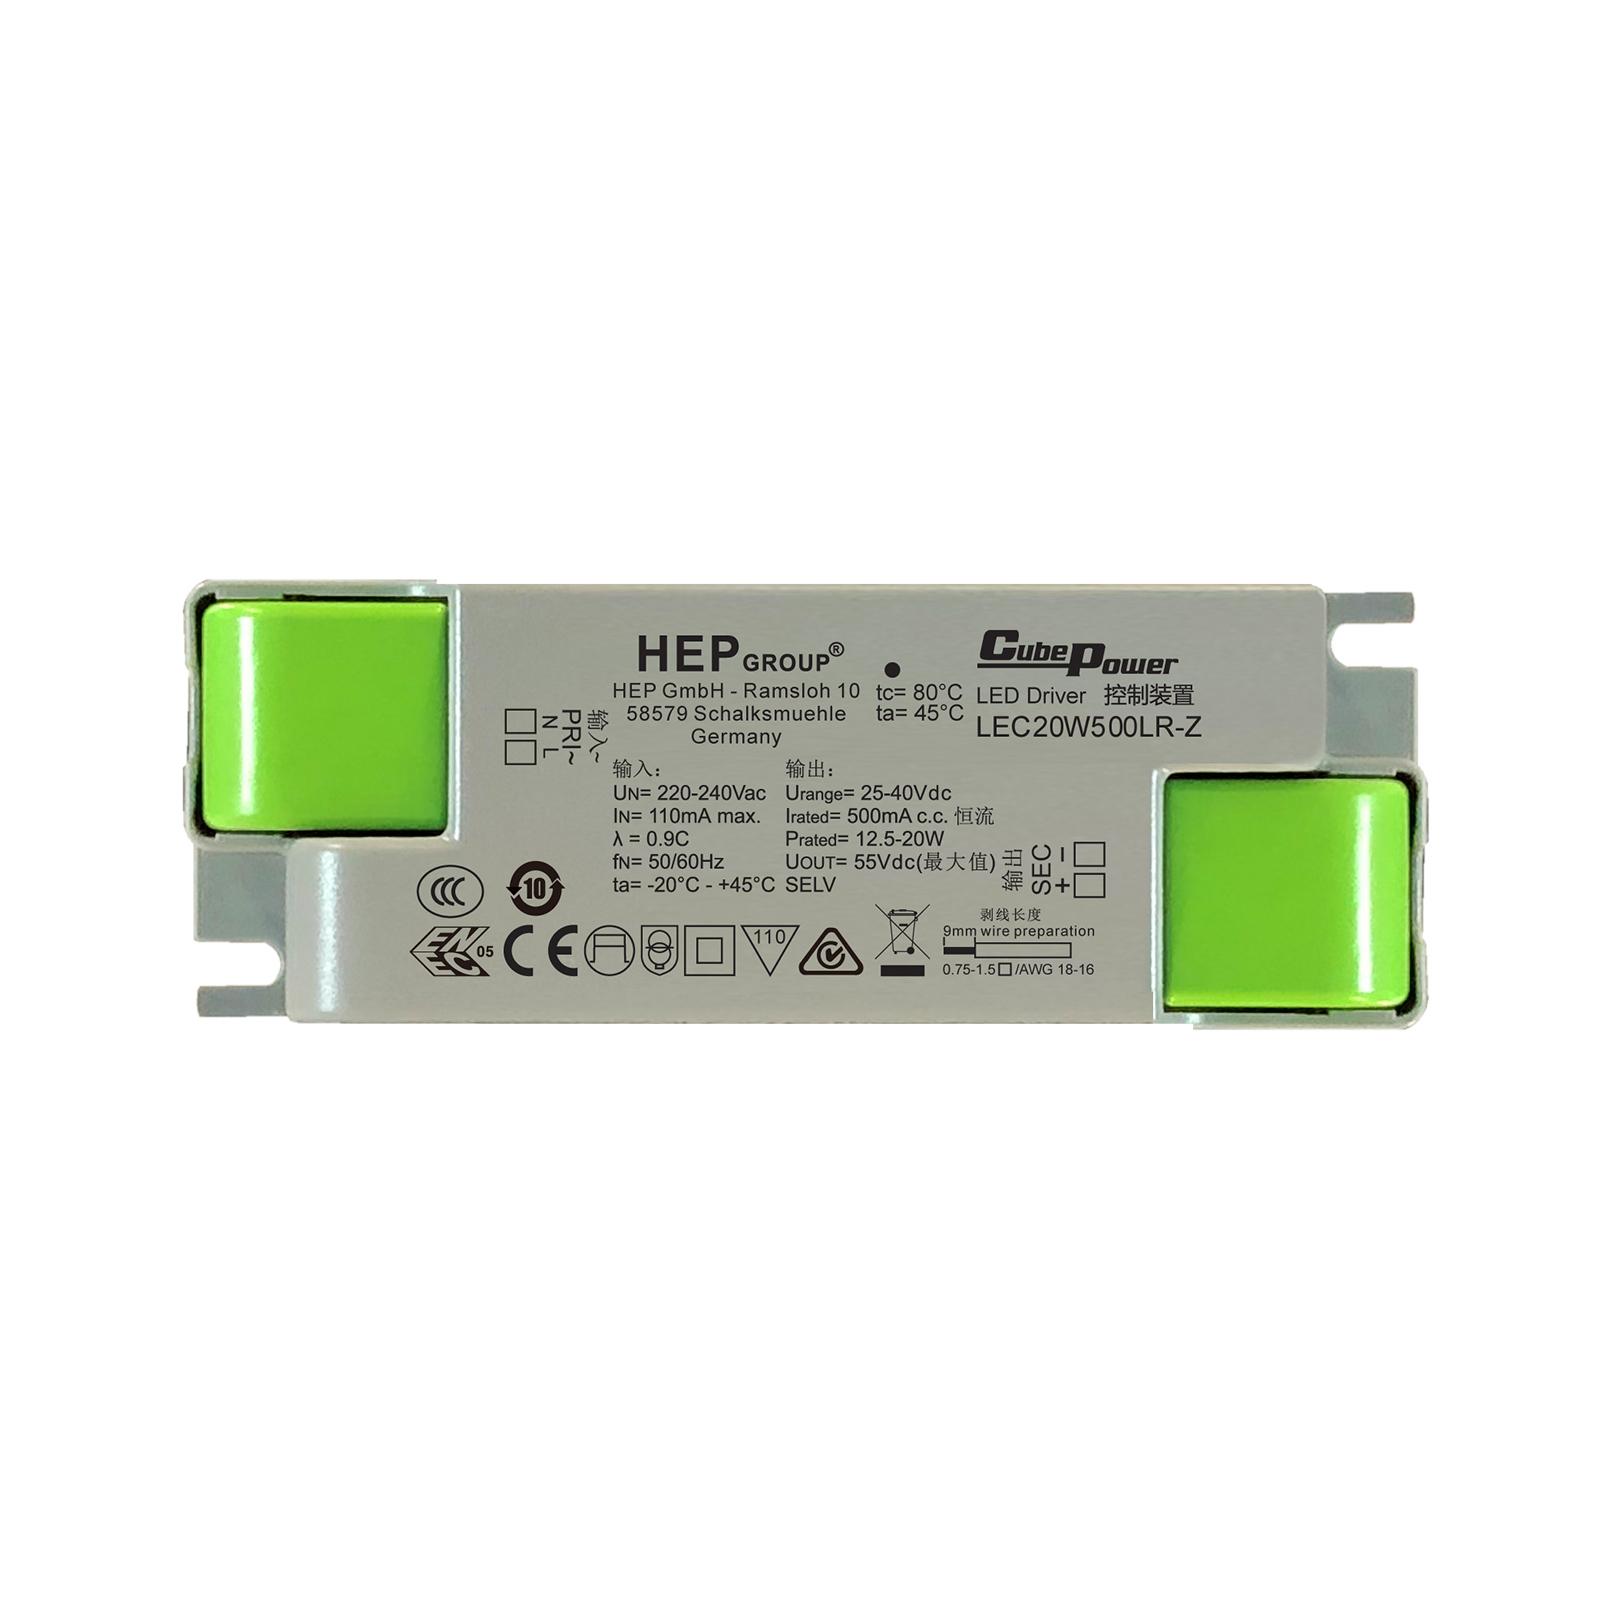 LED-Treiber LEC, 20 W, 500 mA, CC